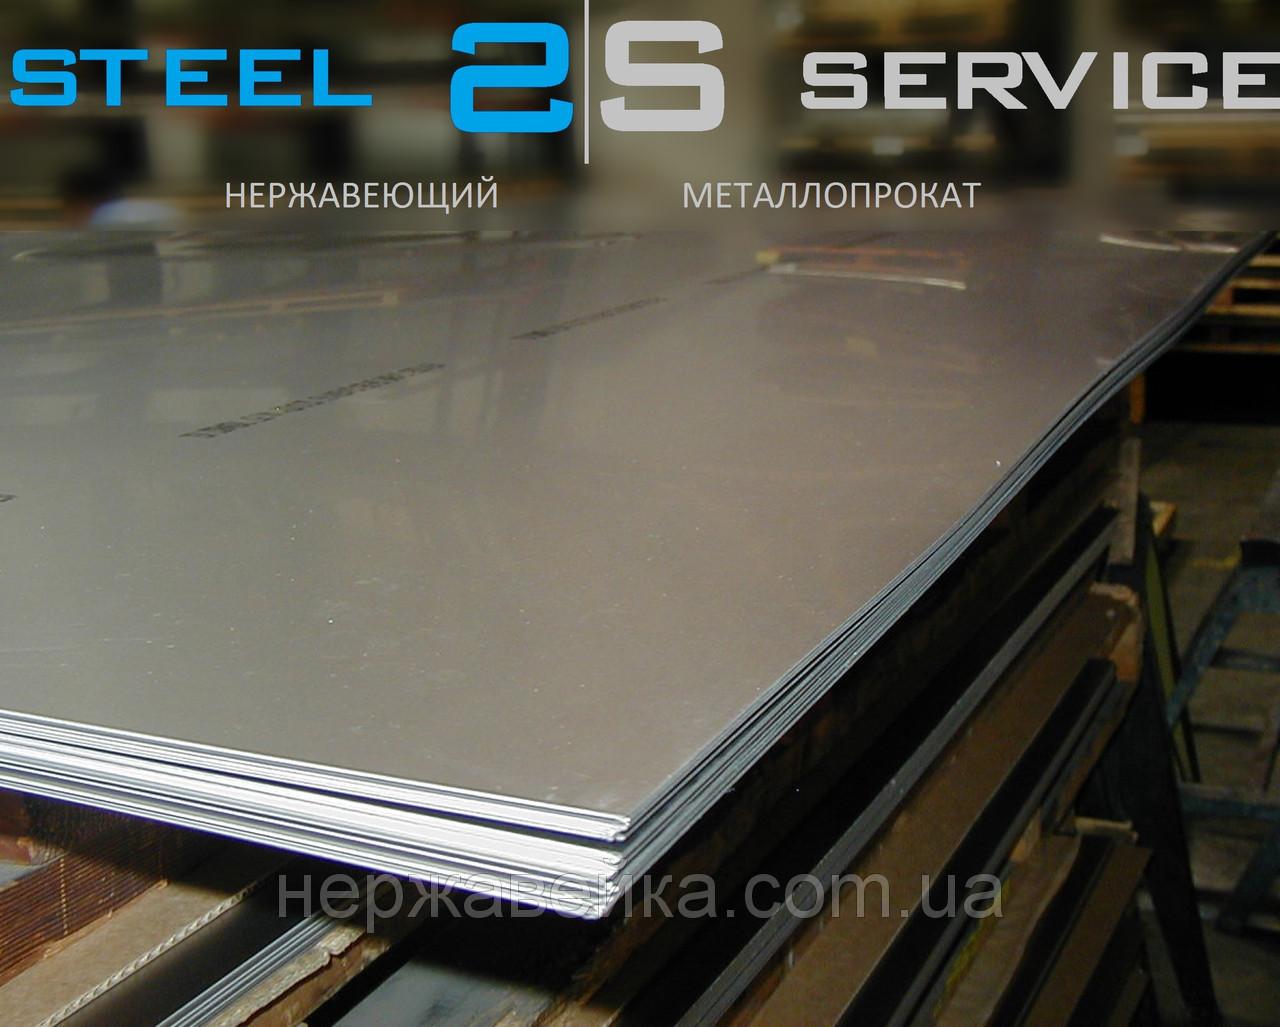 Нержавейка лист 30х1000х2000мм  AISI 316L(03Х17Н14М3) F1 - горячекатанный,  кислотостойкий